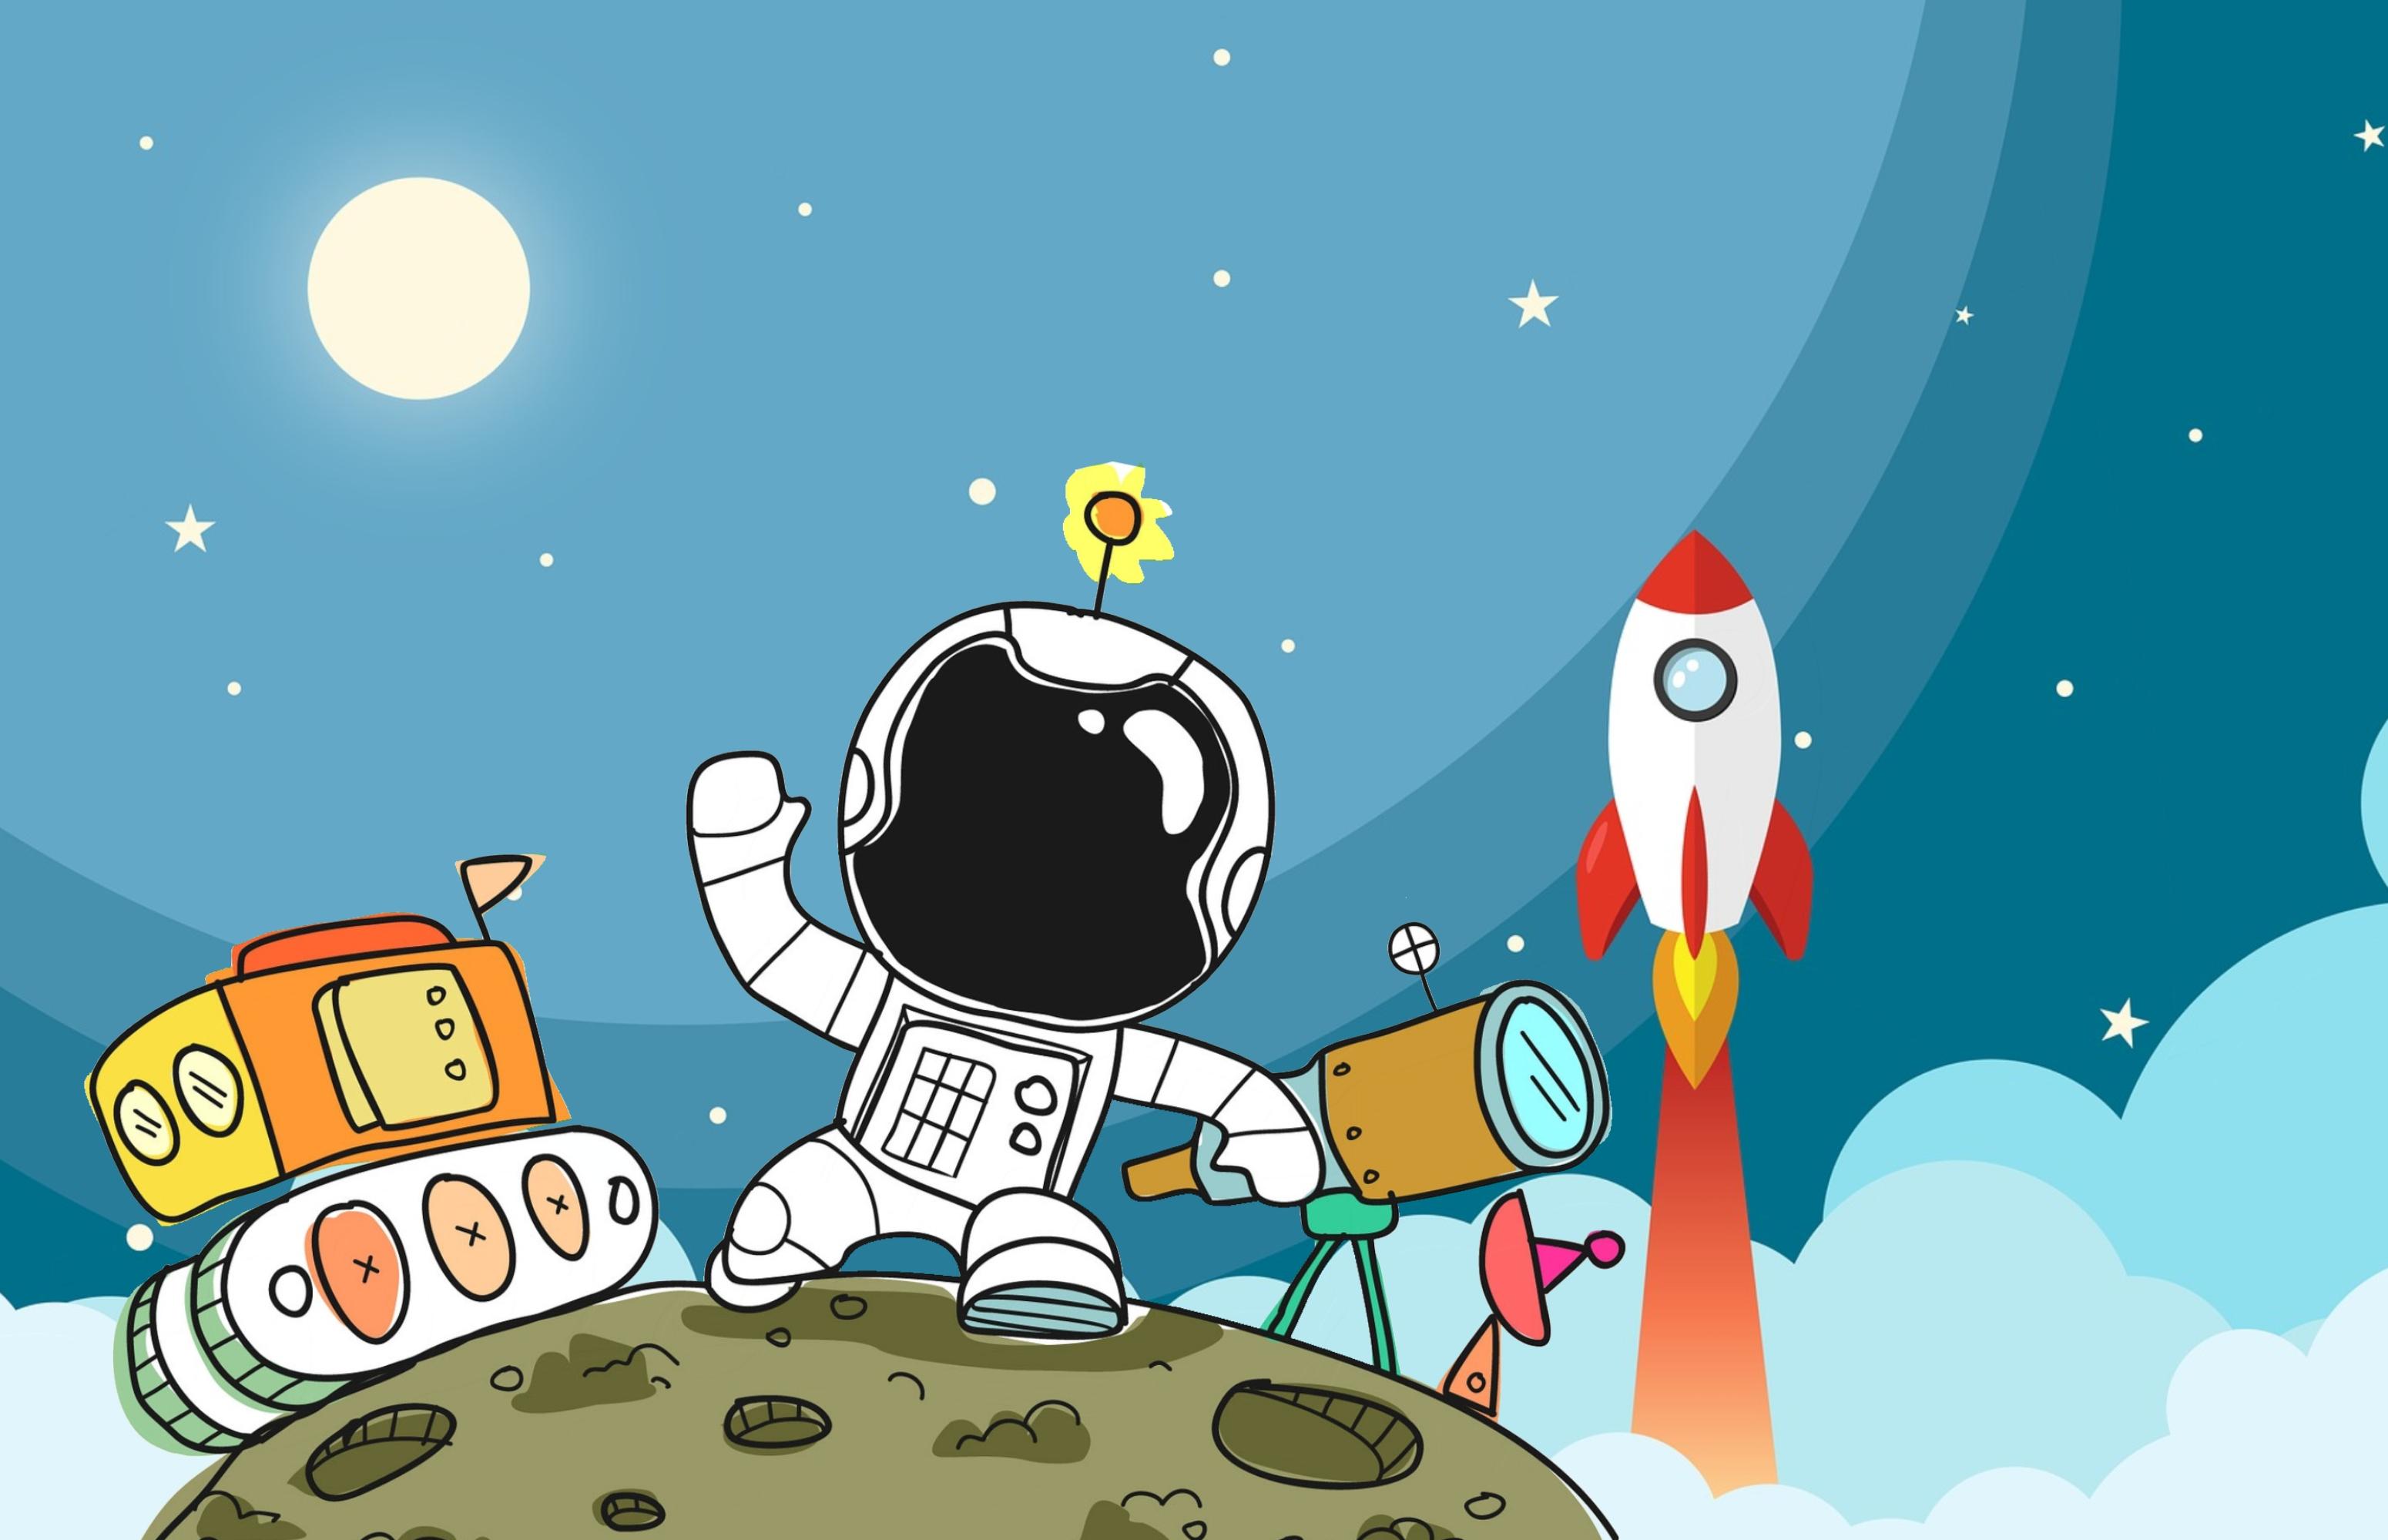 Free Images Spaceman Spaceship Space Astronaut Rocket